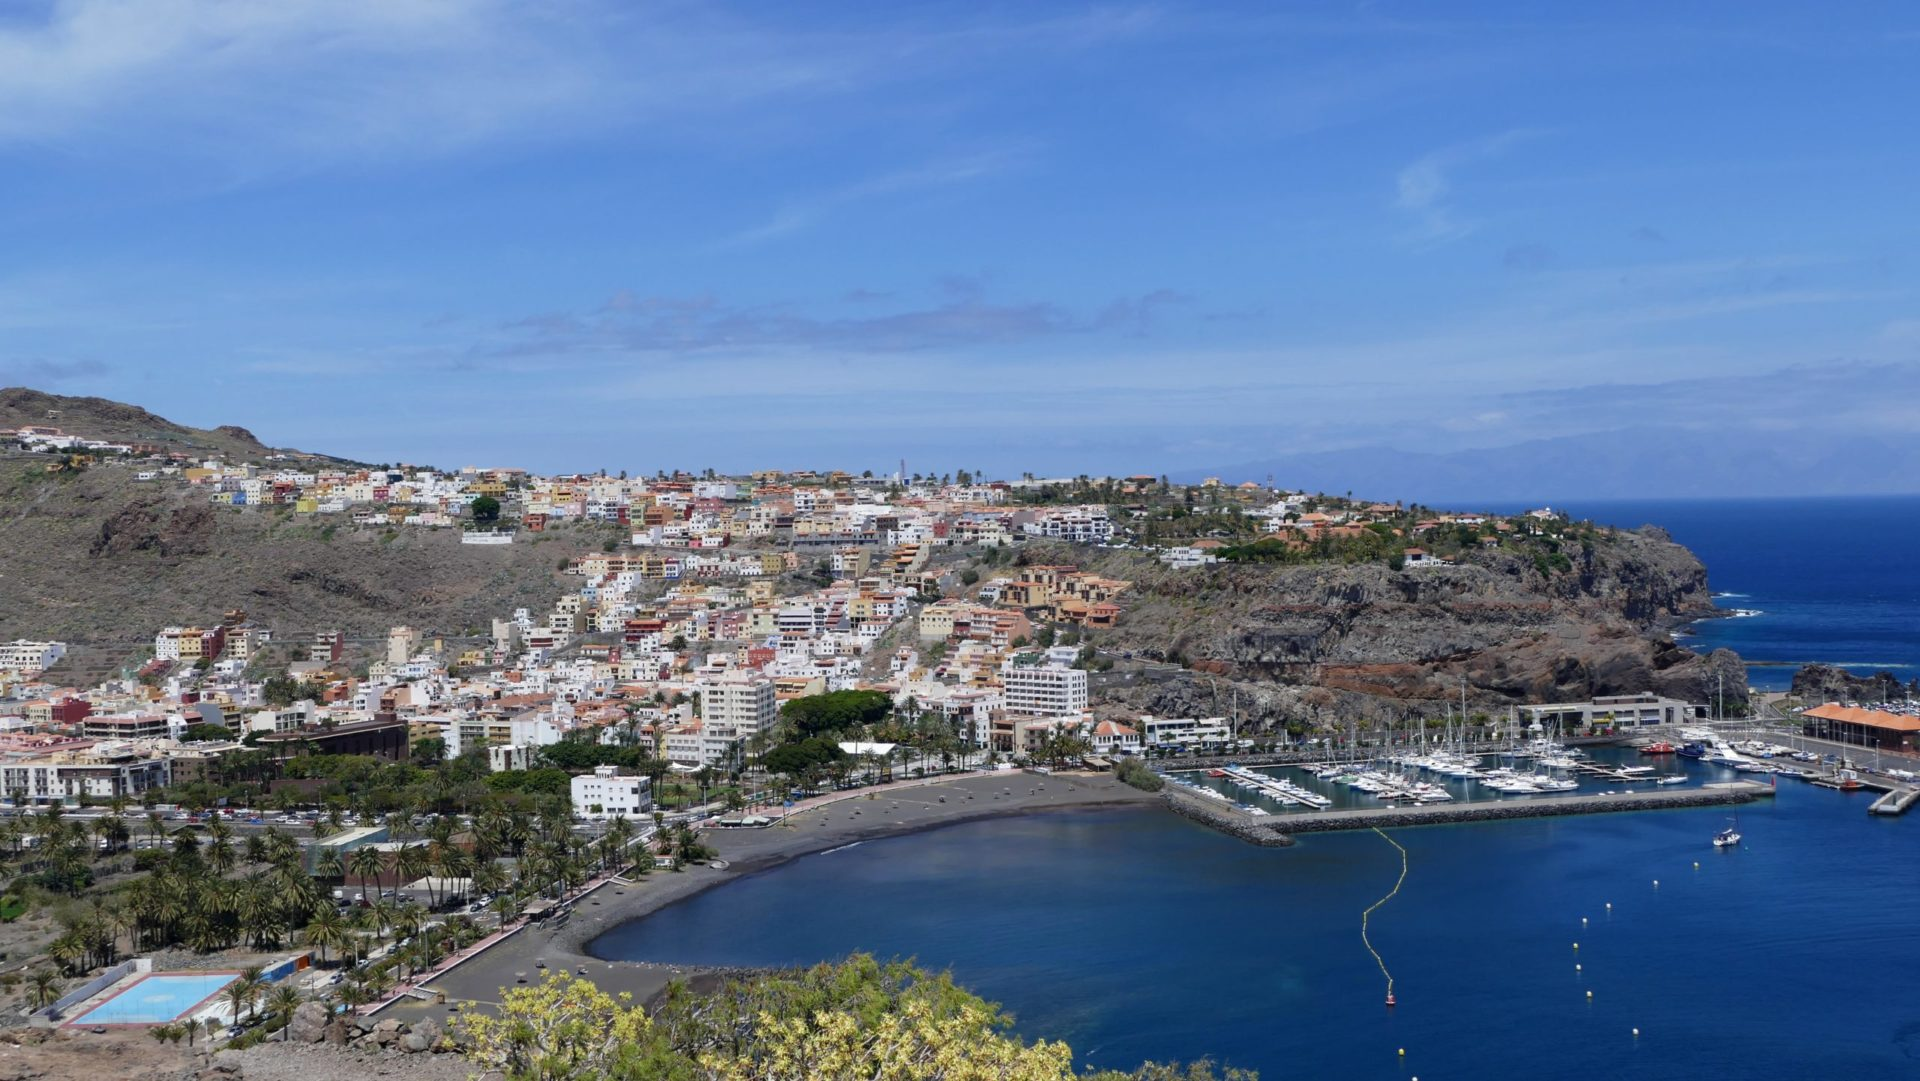 Wassertemperatur La Gomera: Hauptstadt San Sebastián de La Gomera mit Hafen